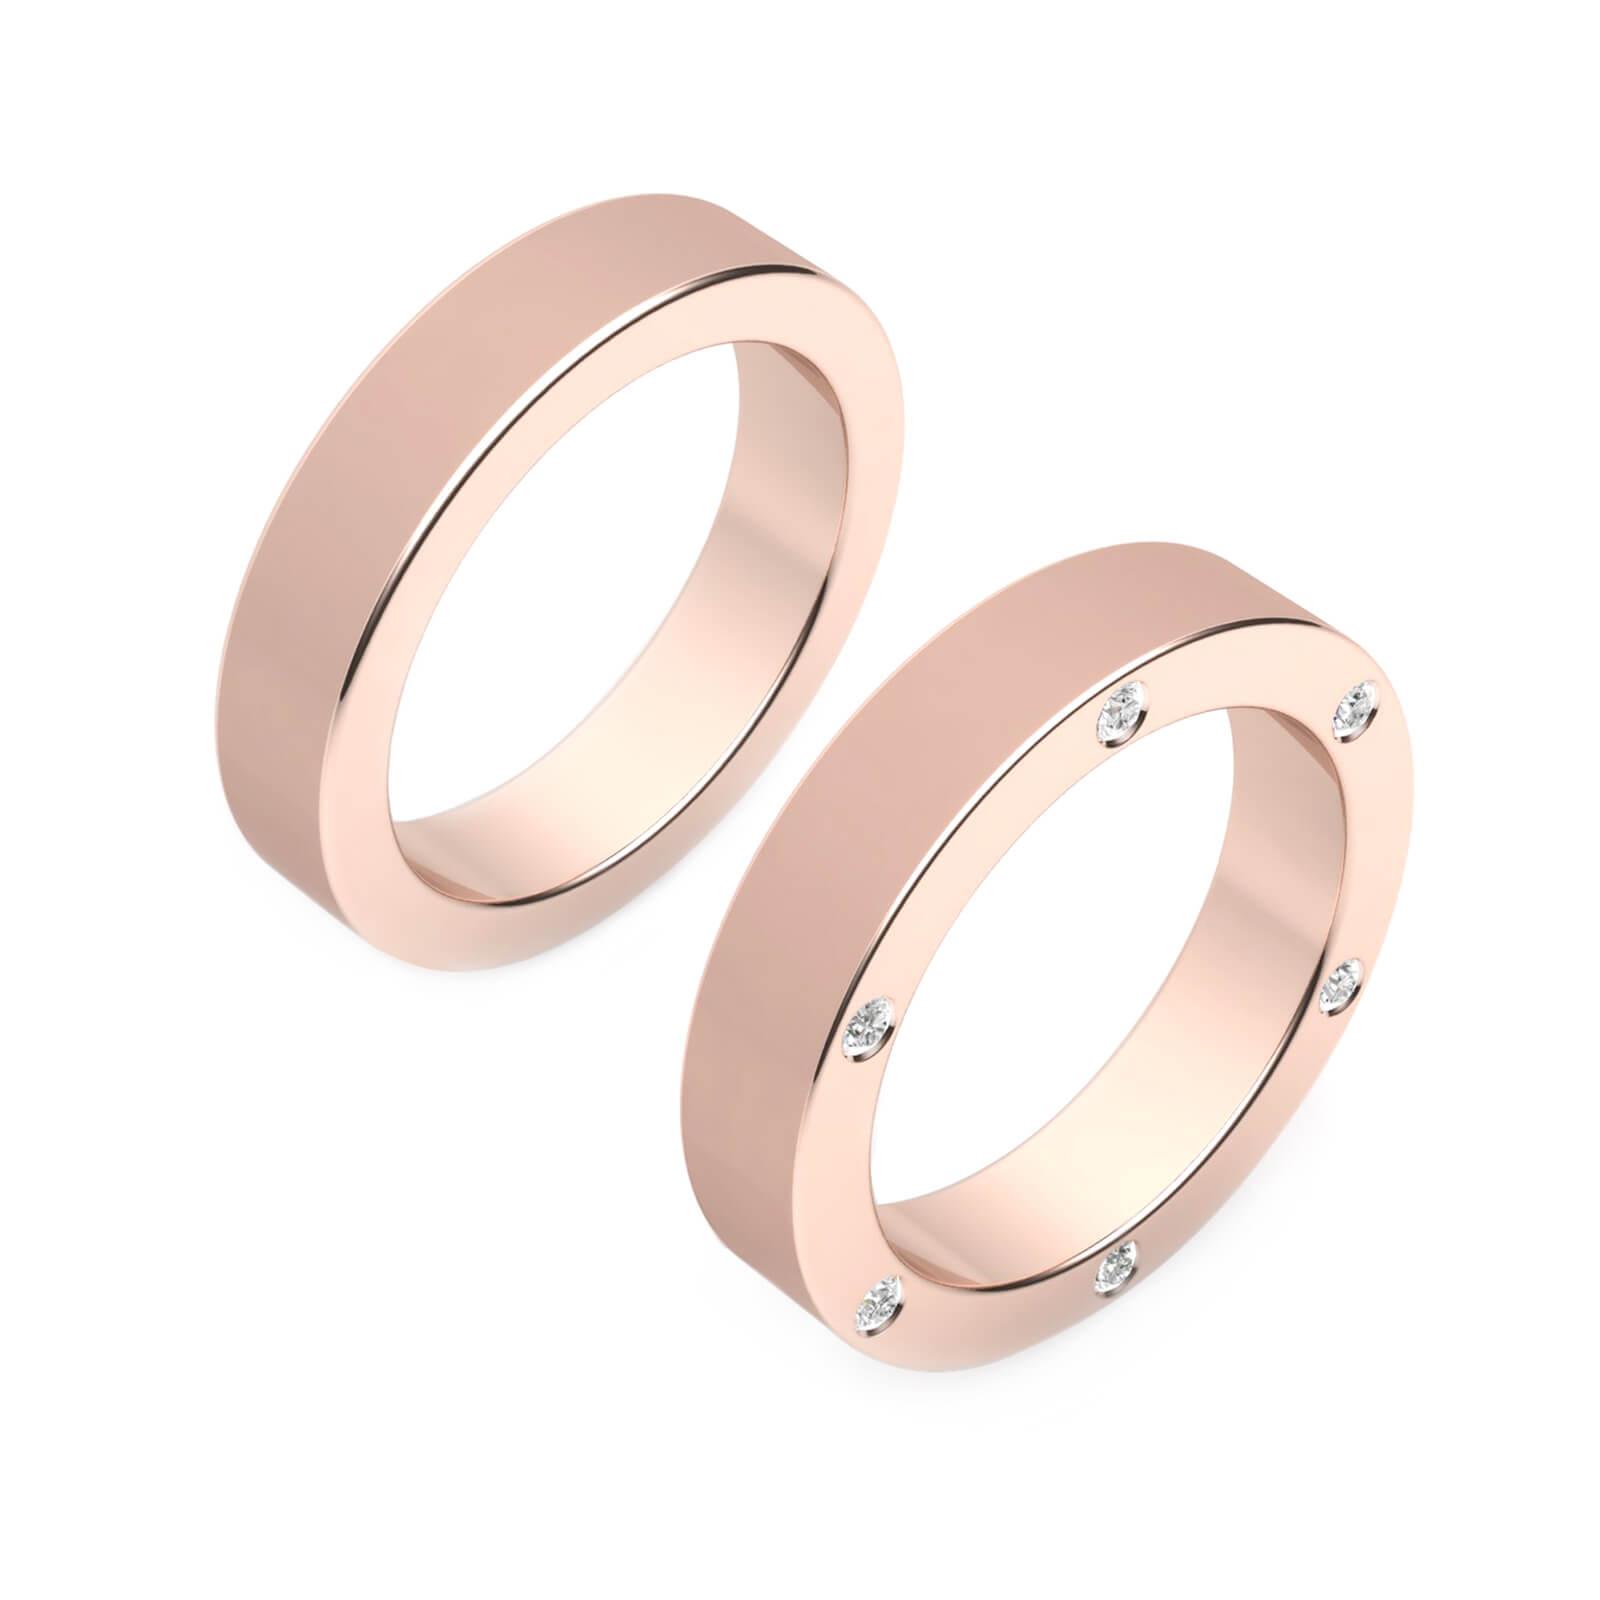 Alianza de boda de oro rosa de 18k con 6 diamantes